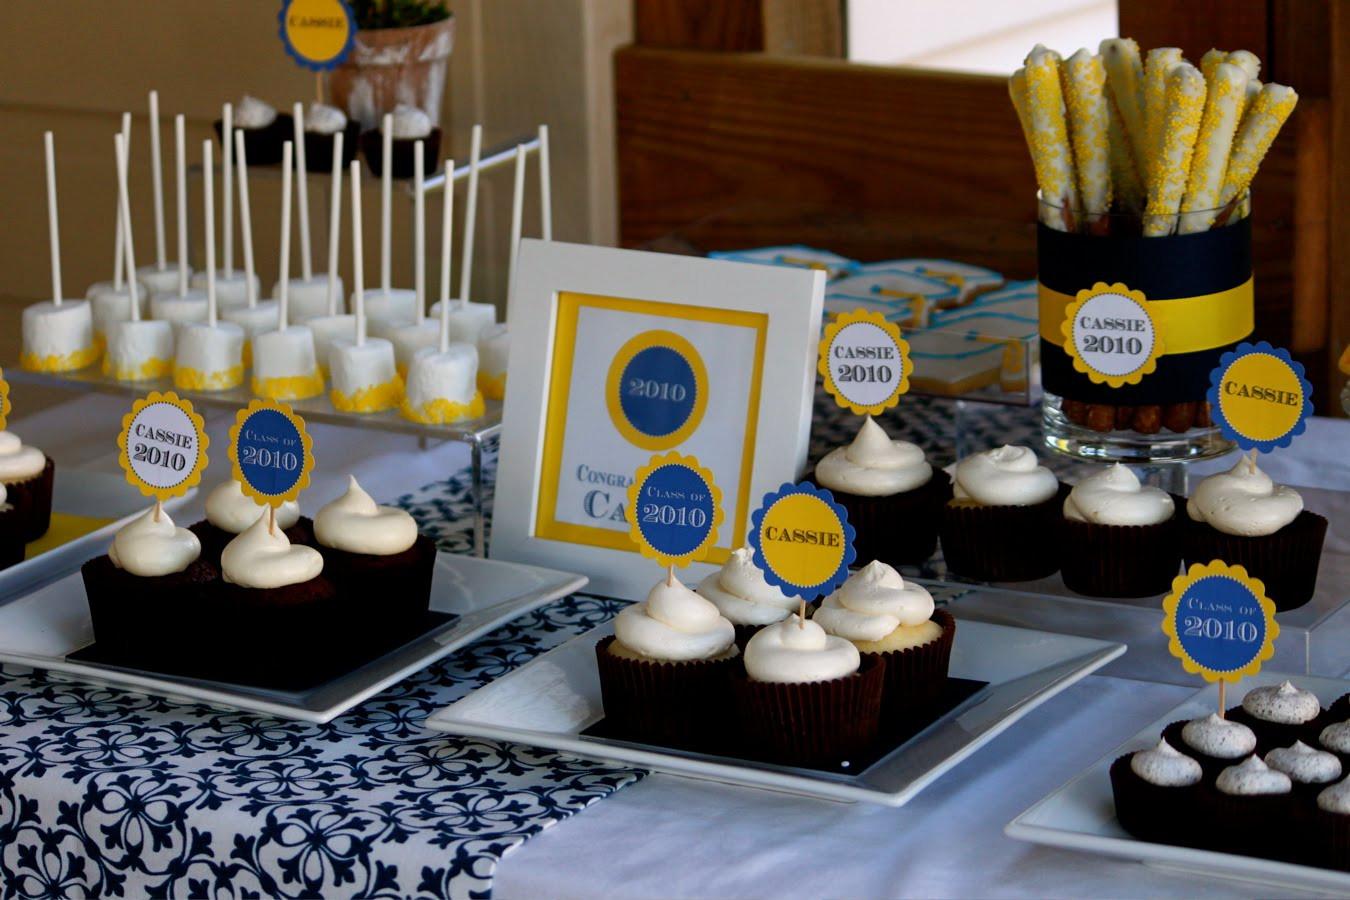 Dessert Table Ideas For Graduation Party  Cassie's Graduation Dessert Table